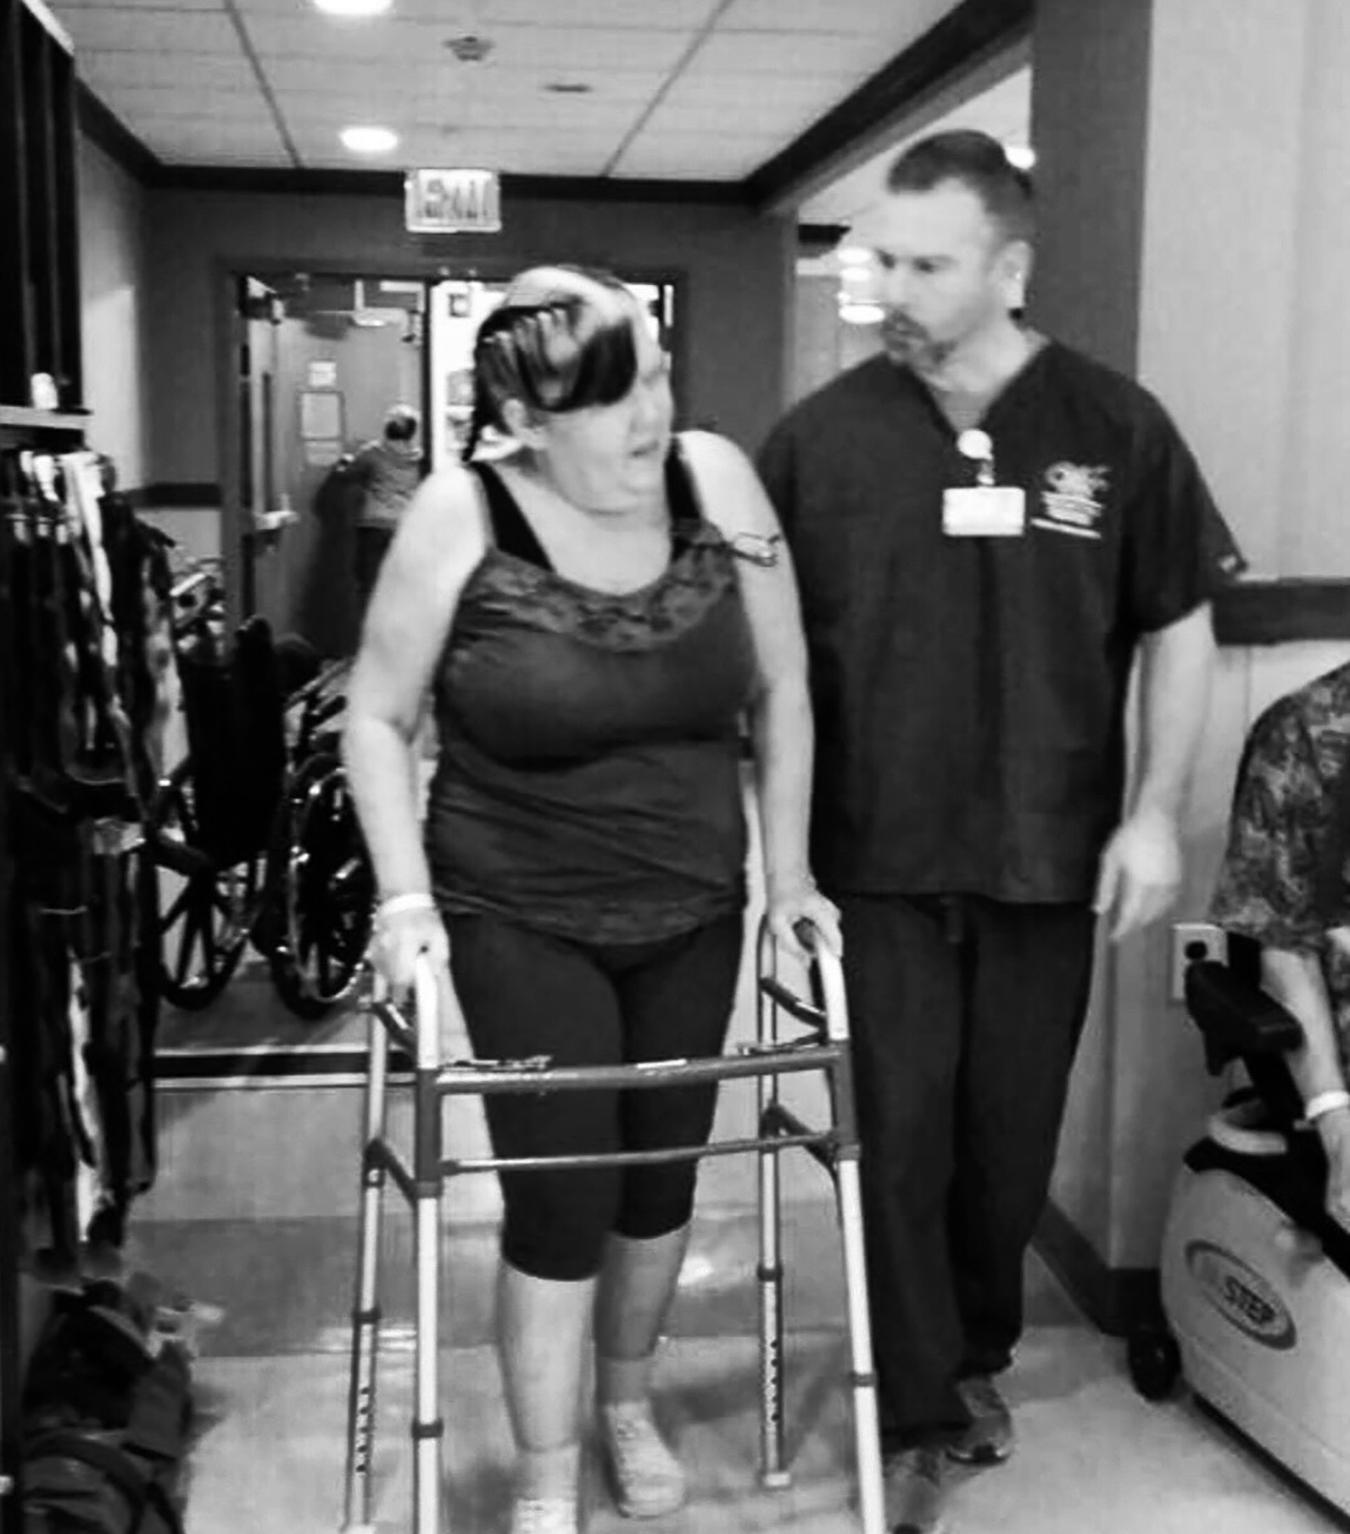 Katie_kerl_mom_hospital_walker_family_love